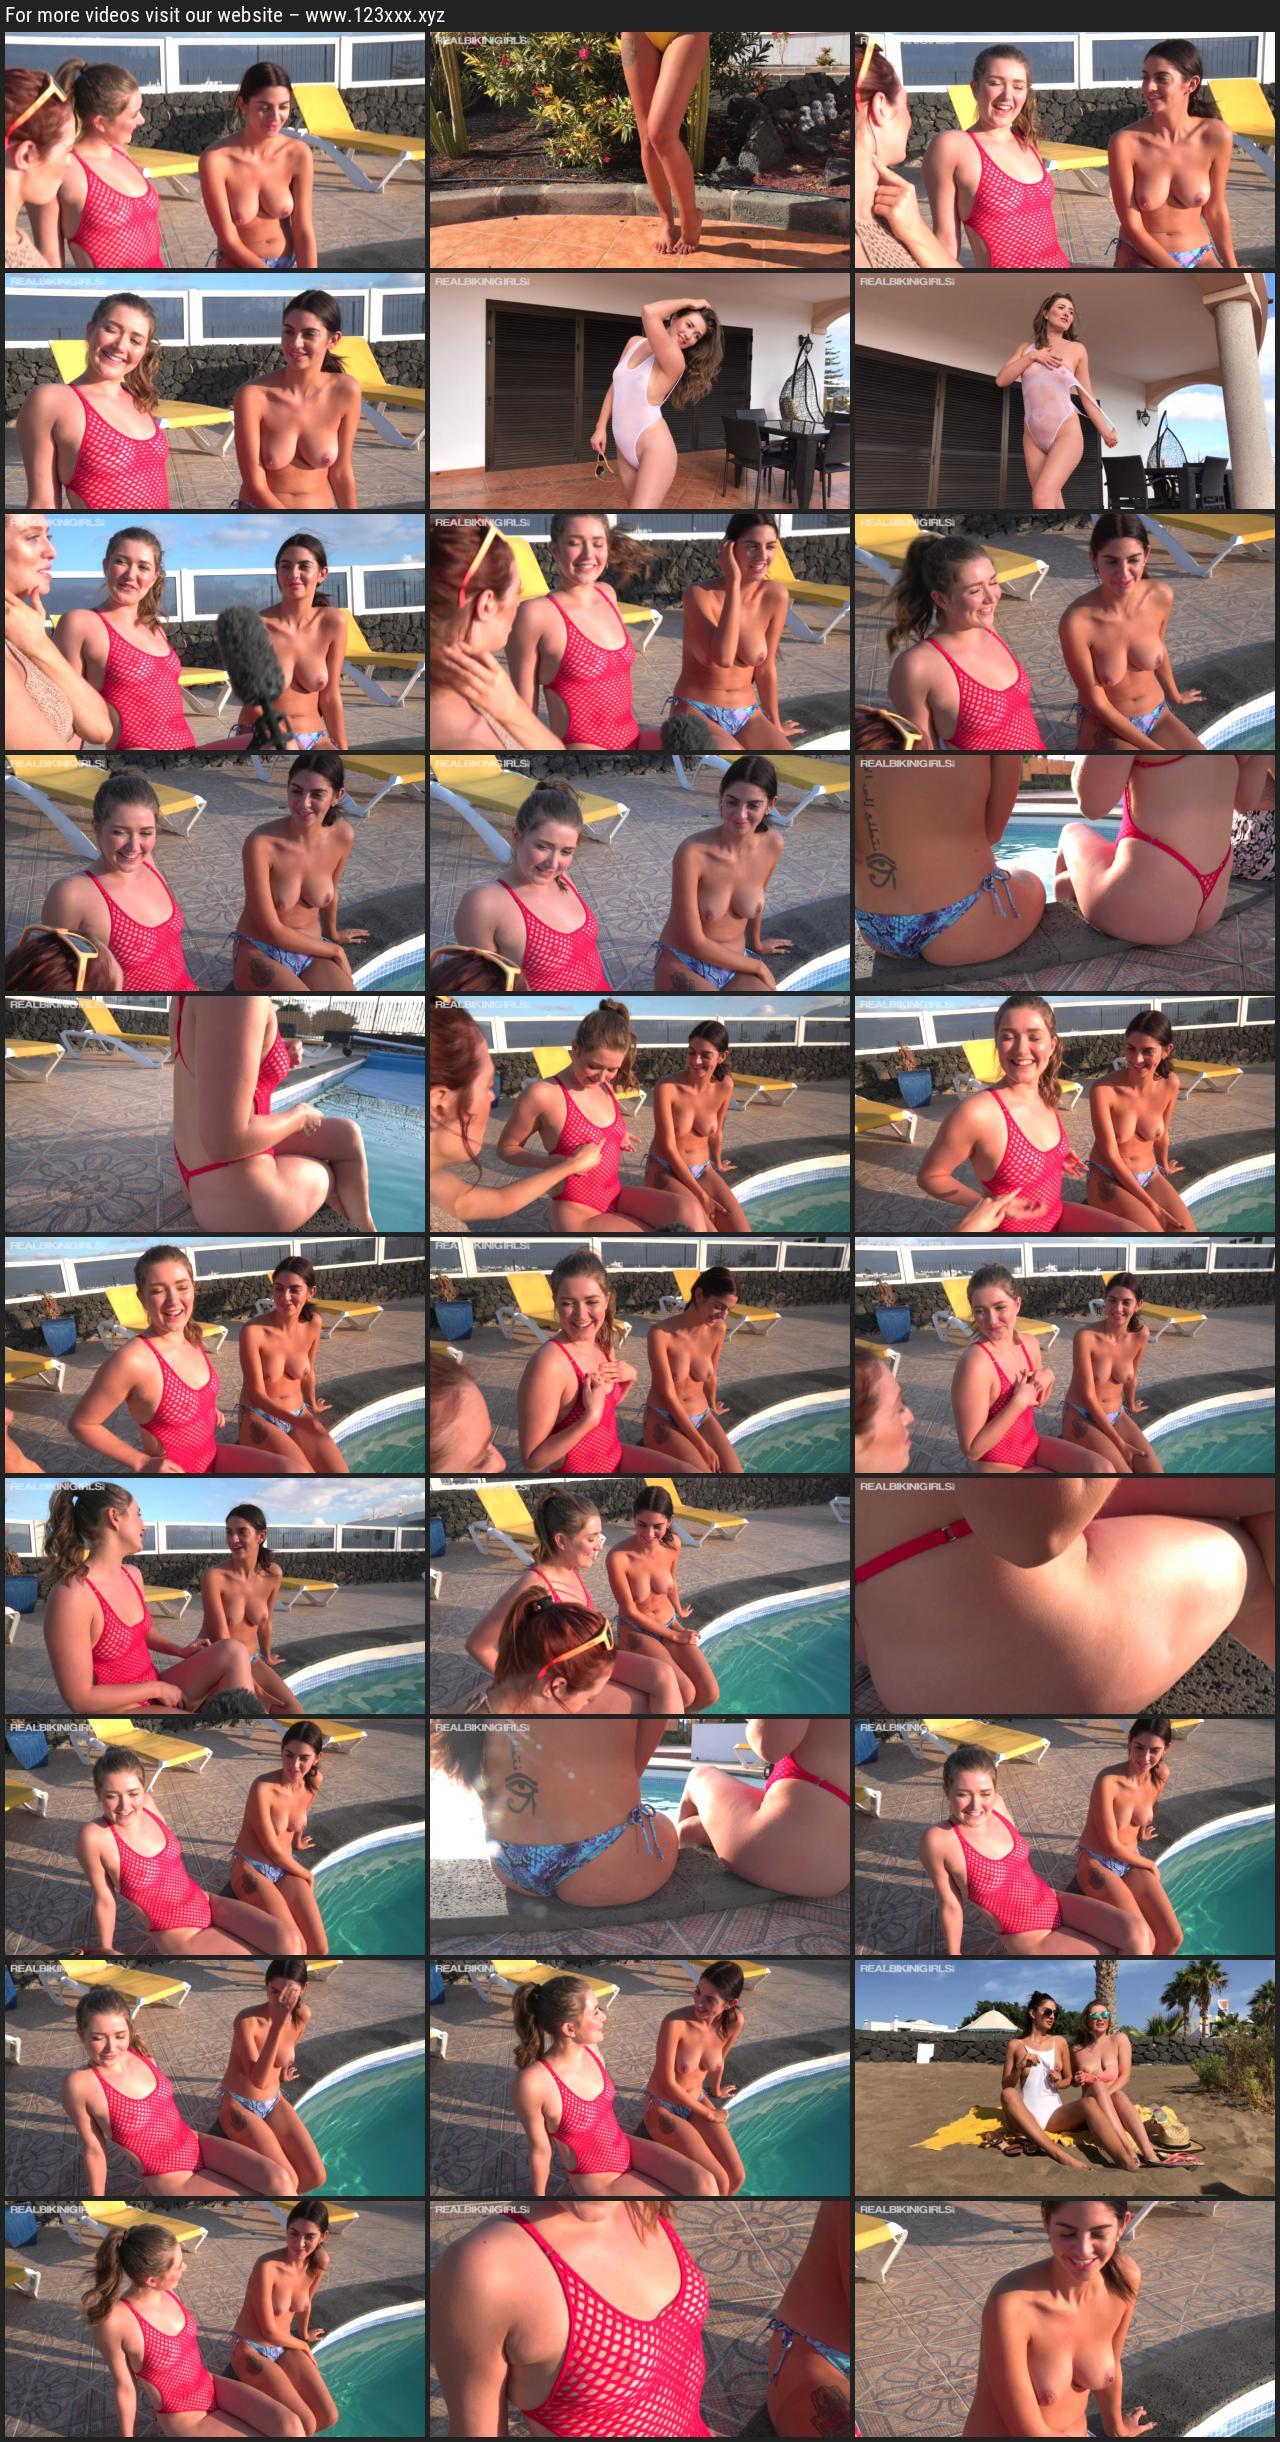 realbikinigirls.18.01.08.eden.b.and.jessica.pool.side.banter_thumbs.jpg